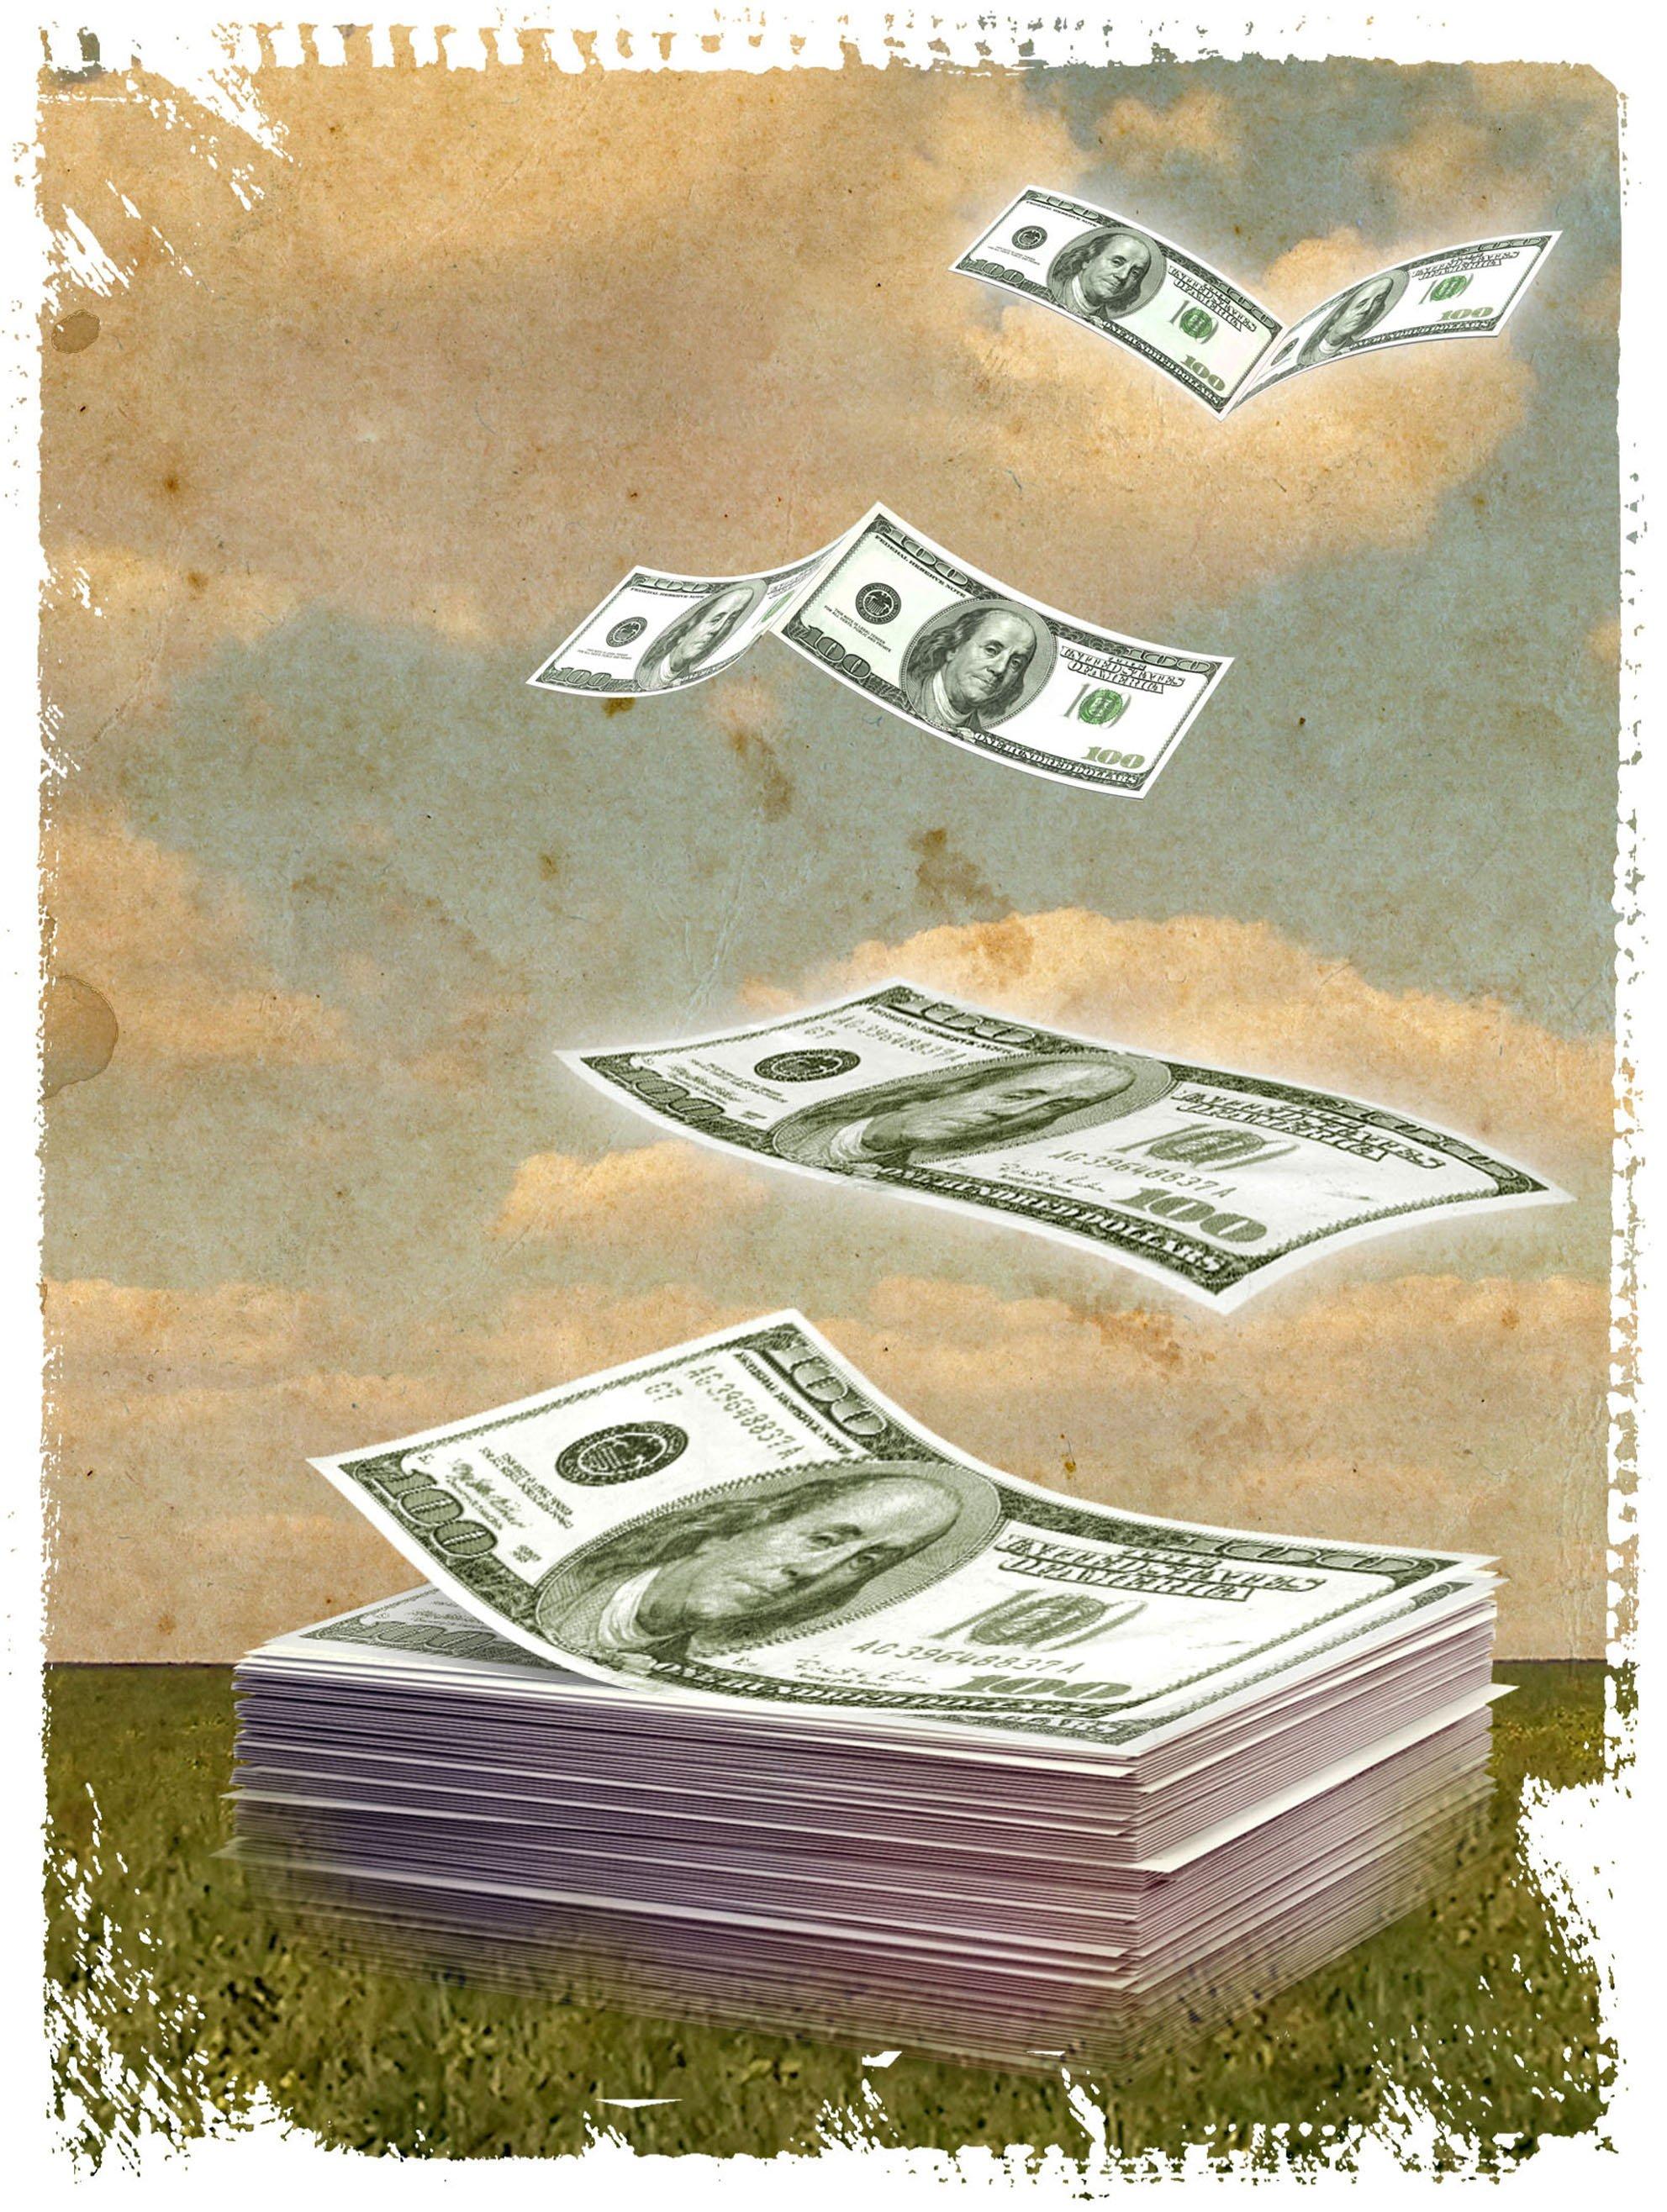 Paul Krugman's 3-part test for deficit spending